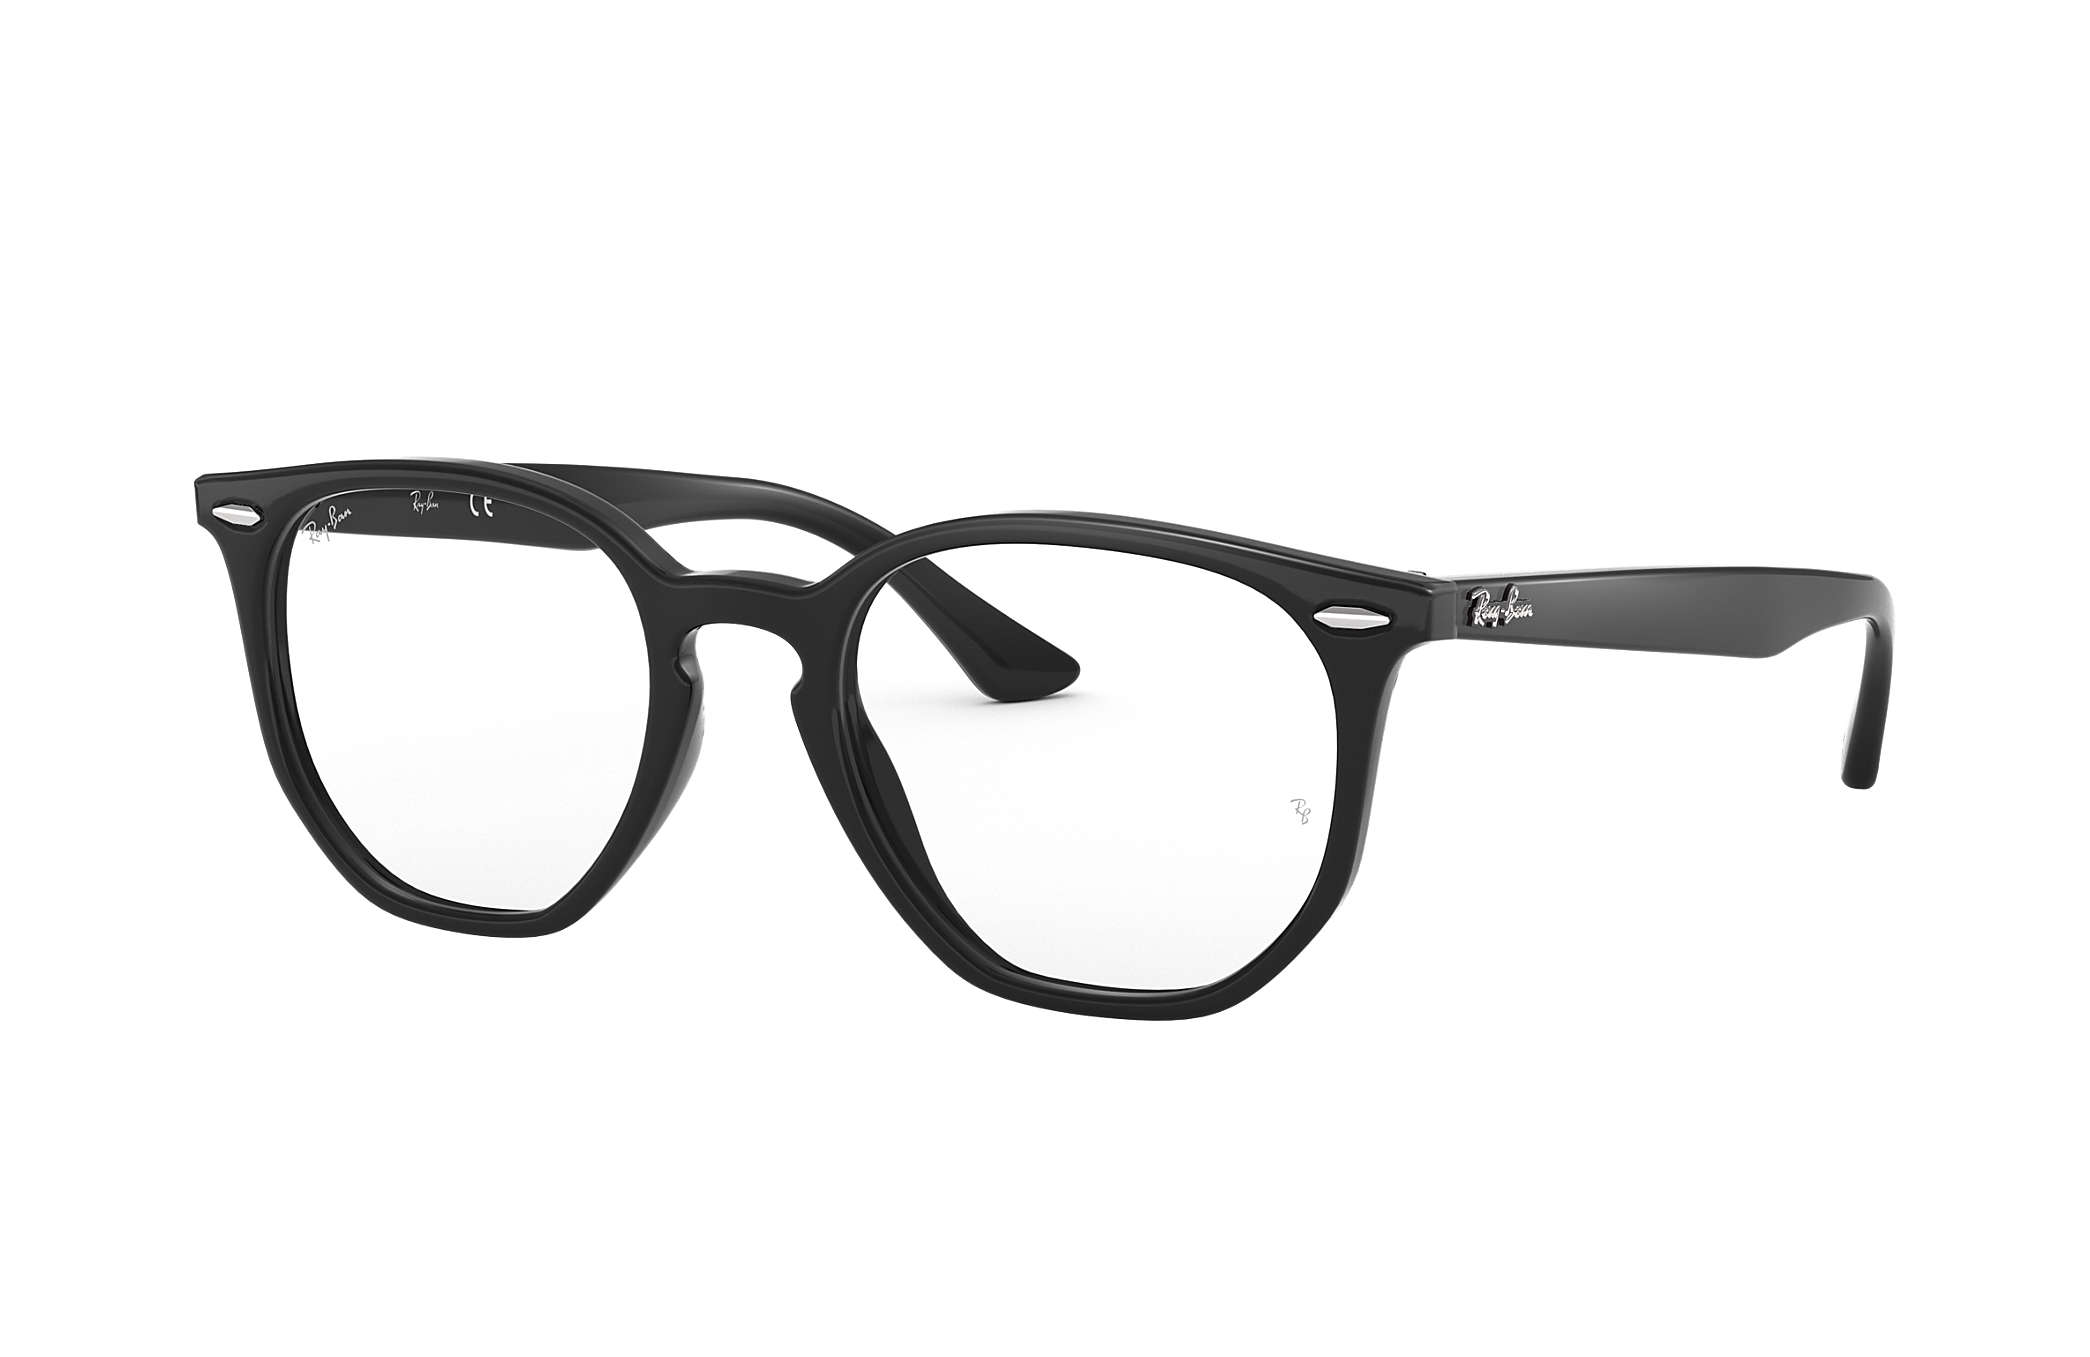 6202f2eb5d Ray-Ban prescription glasses Hexagonal Optics RB7151 Black - Acetate ...